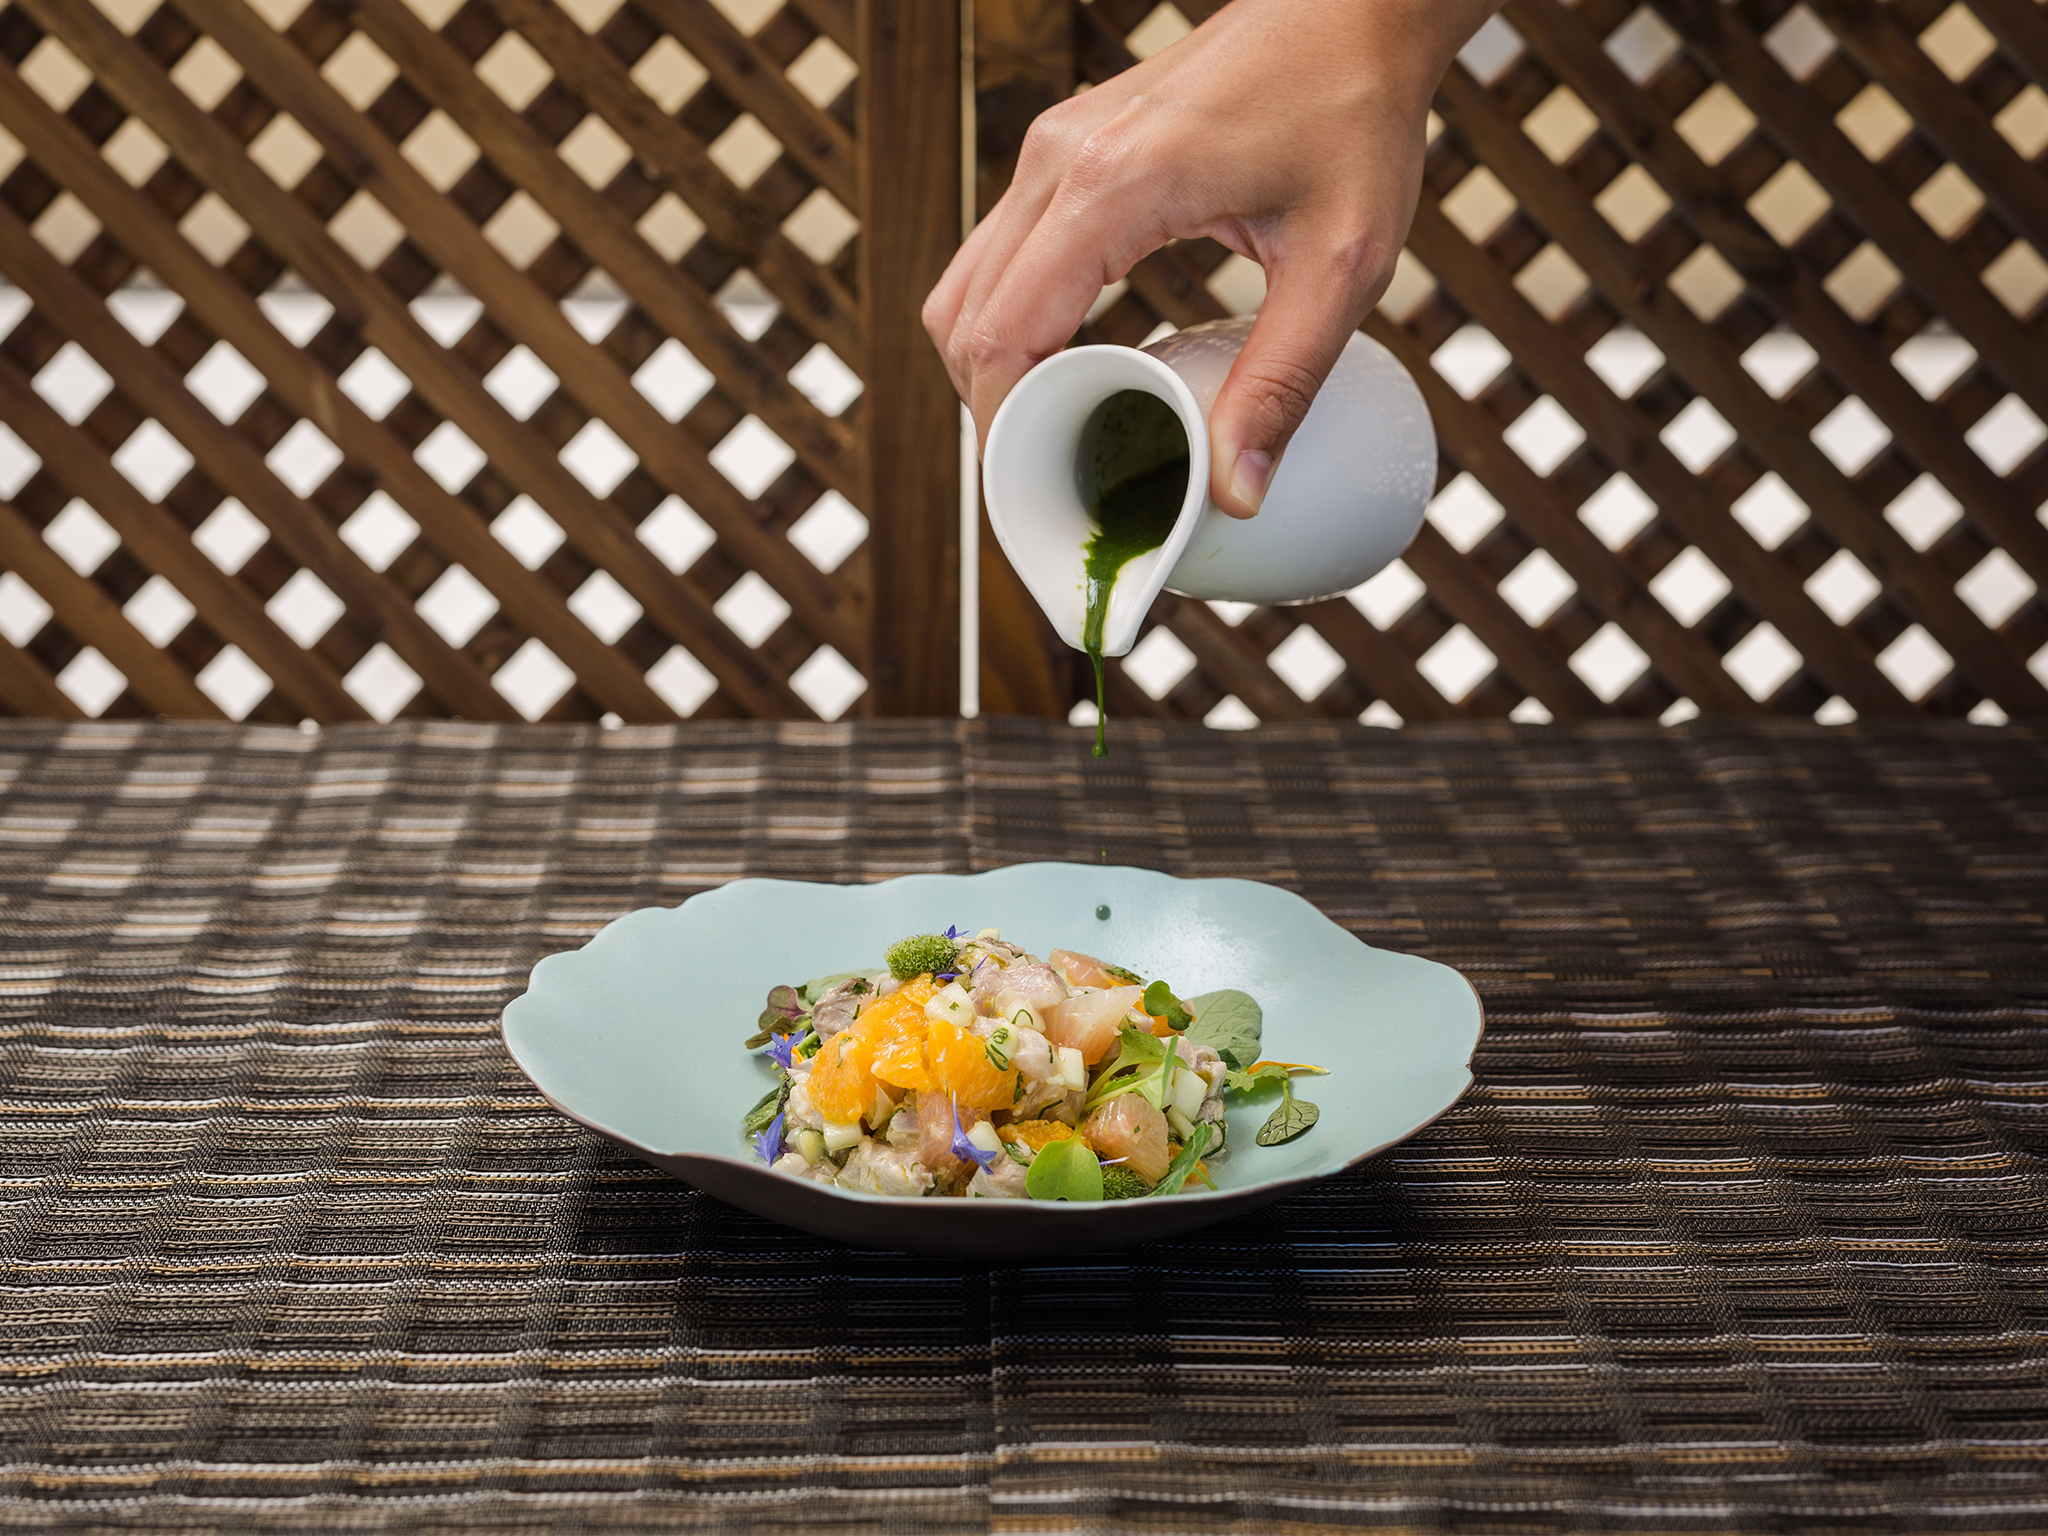 Restaurante, Fortaleza do Guincho, Spot, Ceviche com peixe da lota